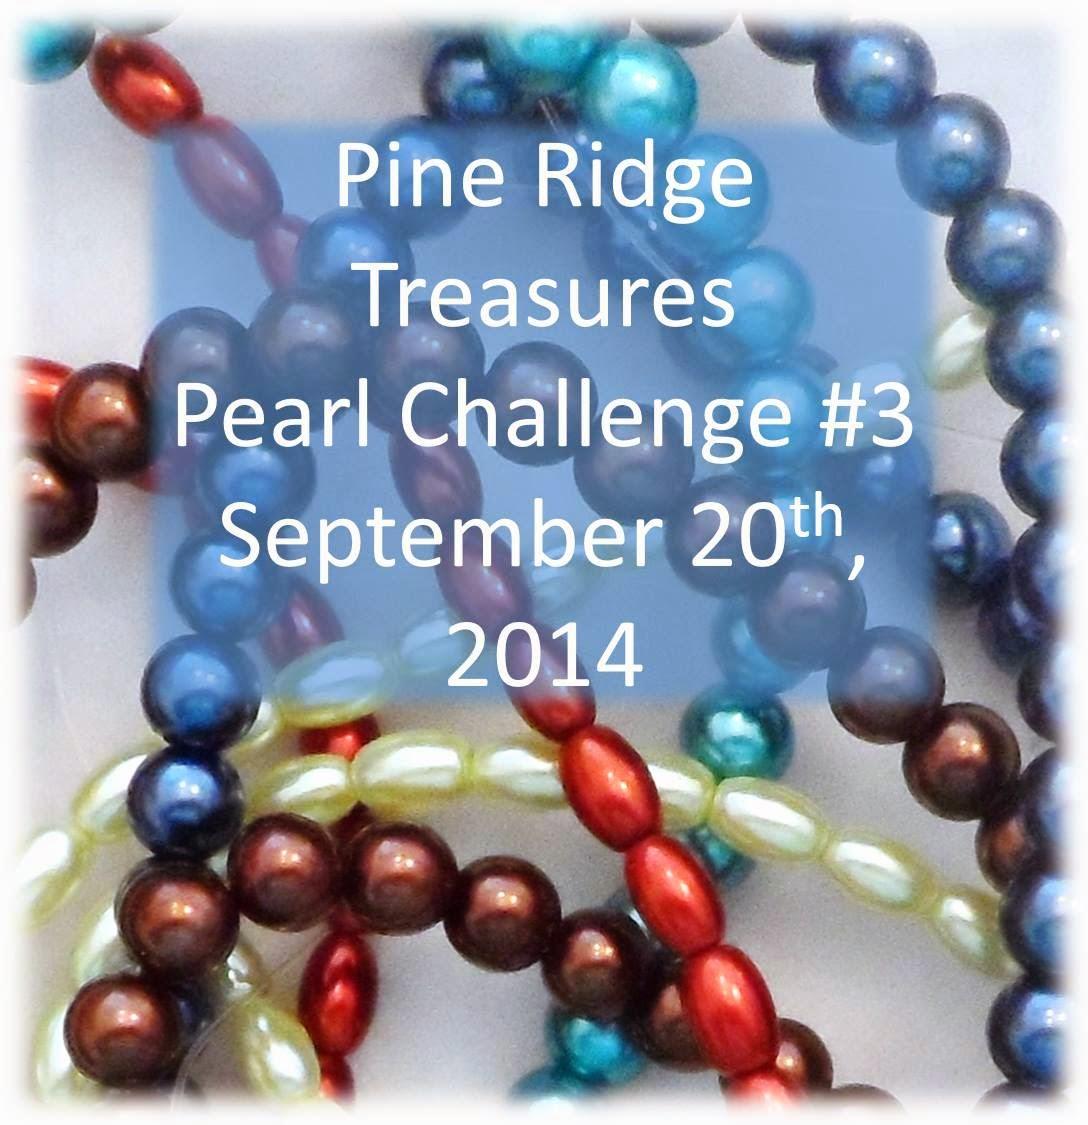 Pearl challenge #3